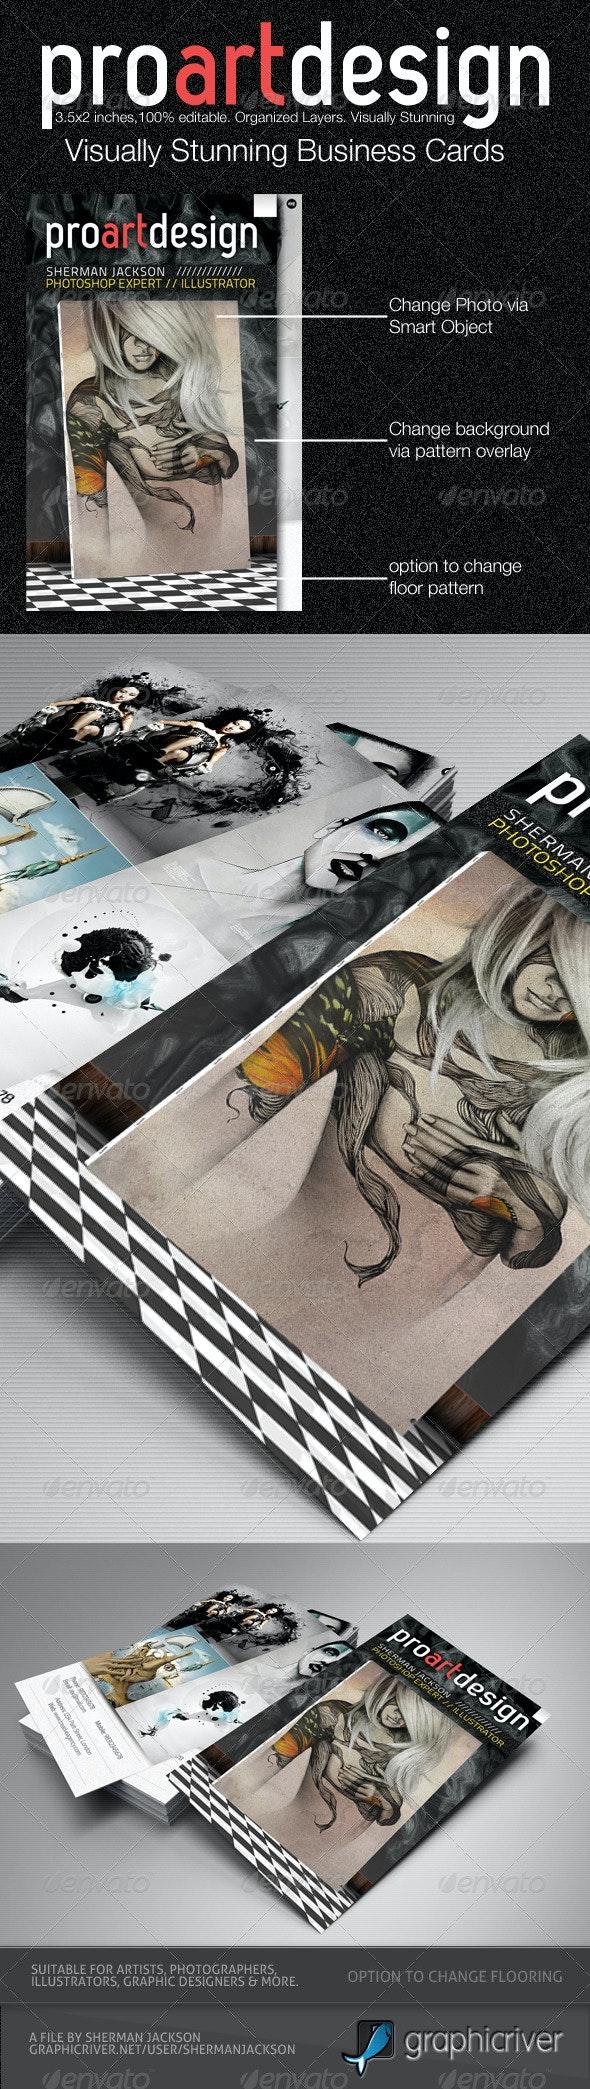 Pro Design - Artistic Business Card Vol.2 PSD - Creative Business Cards